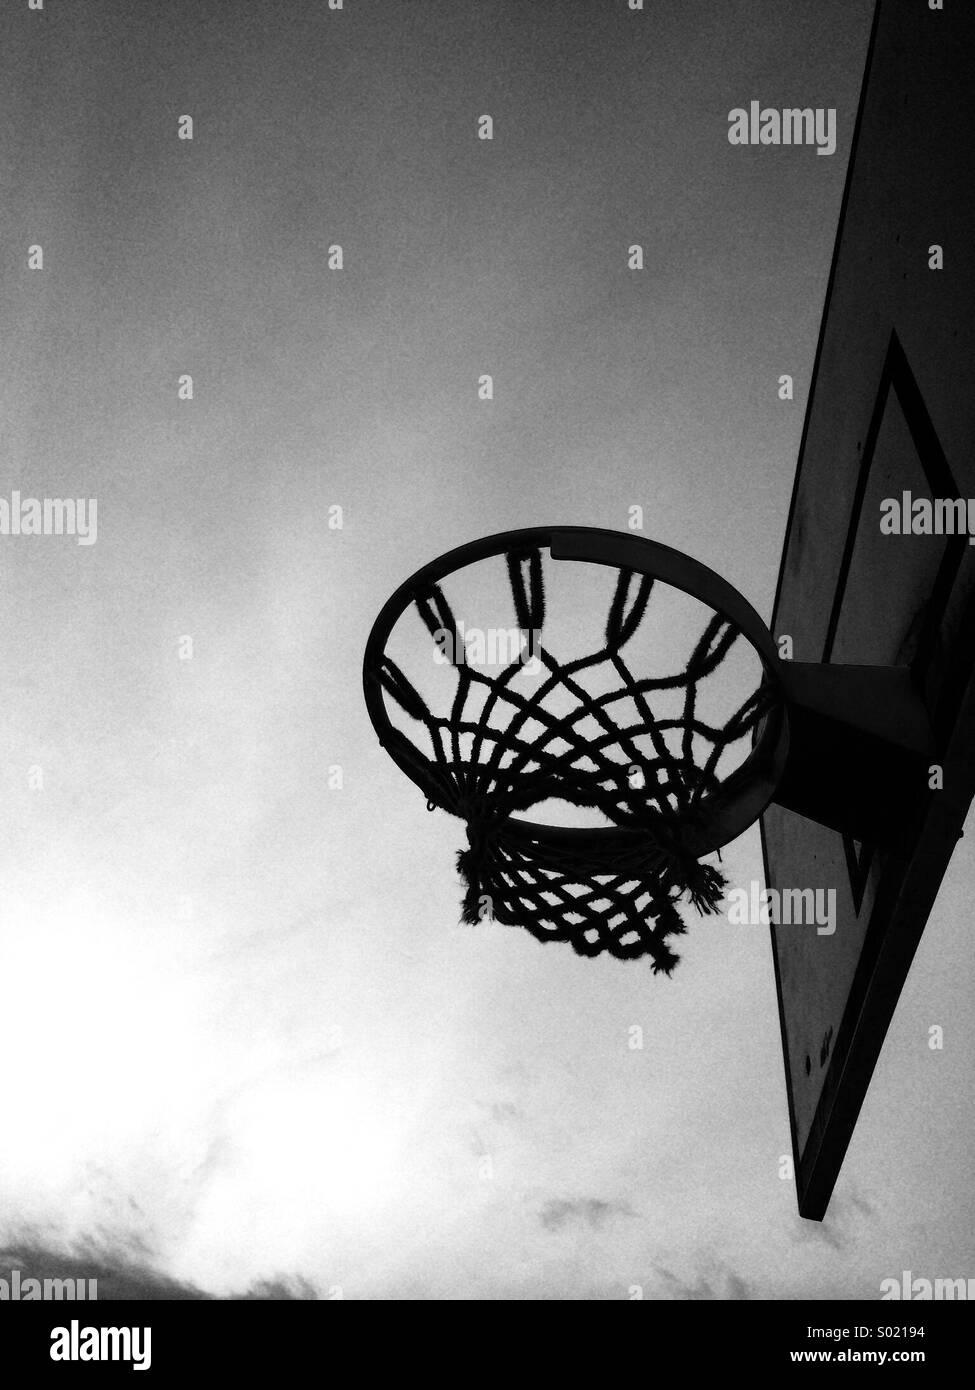 Basket-ball Photo Stock